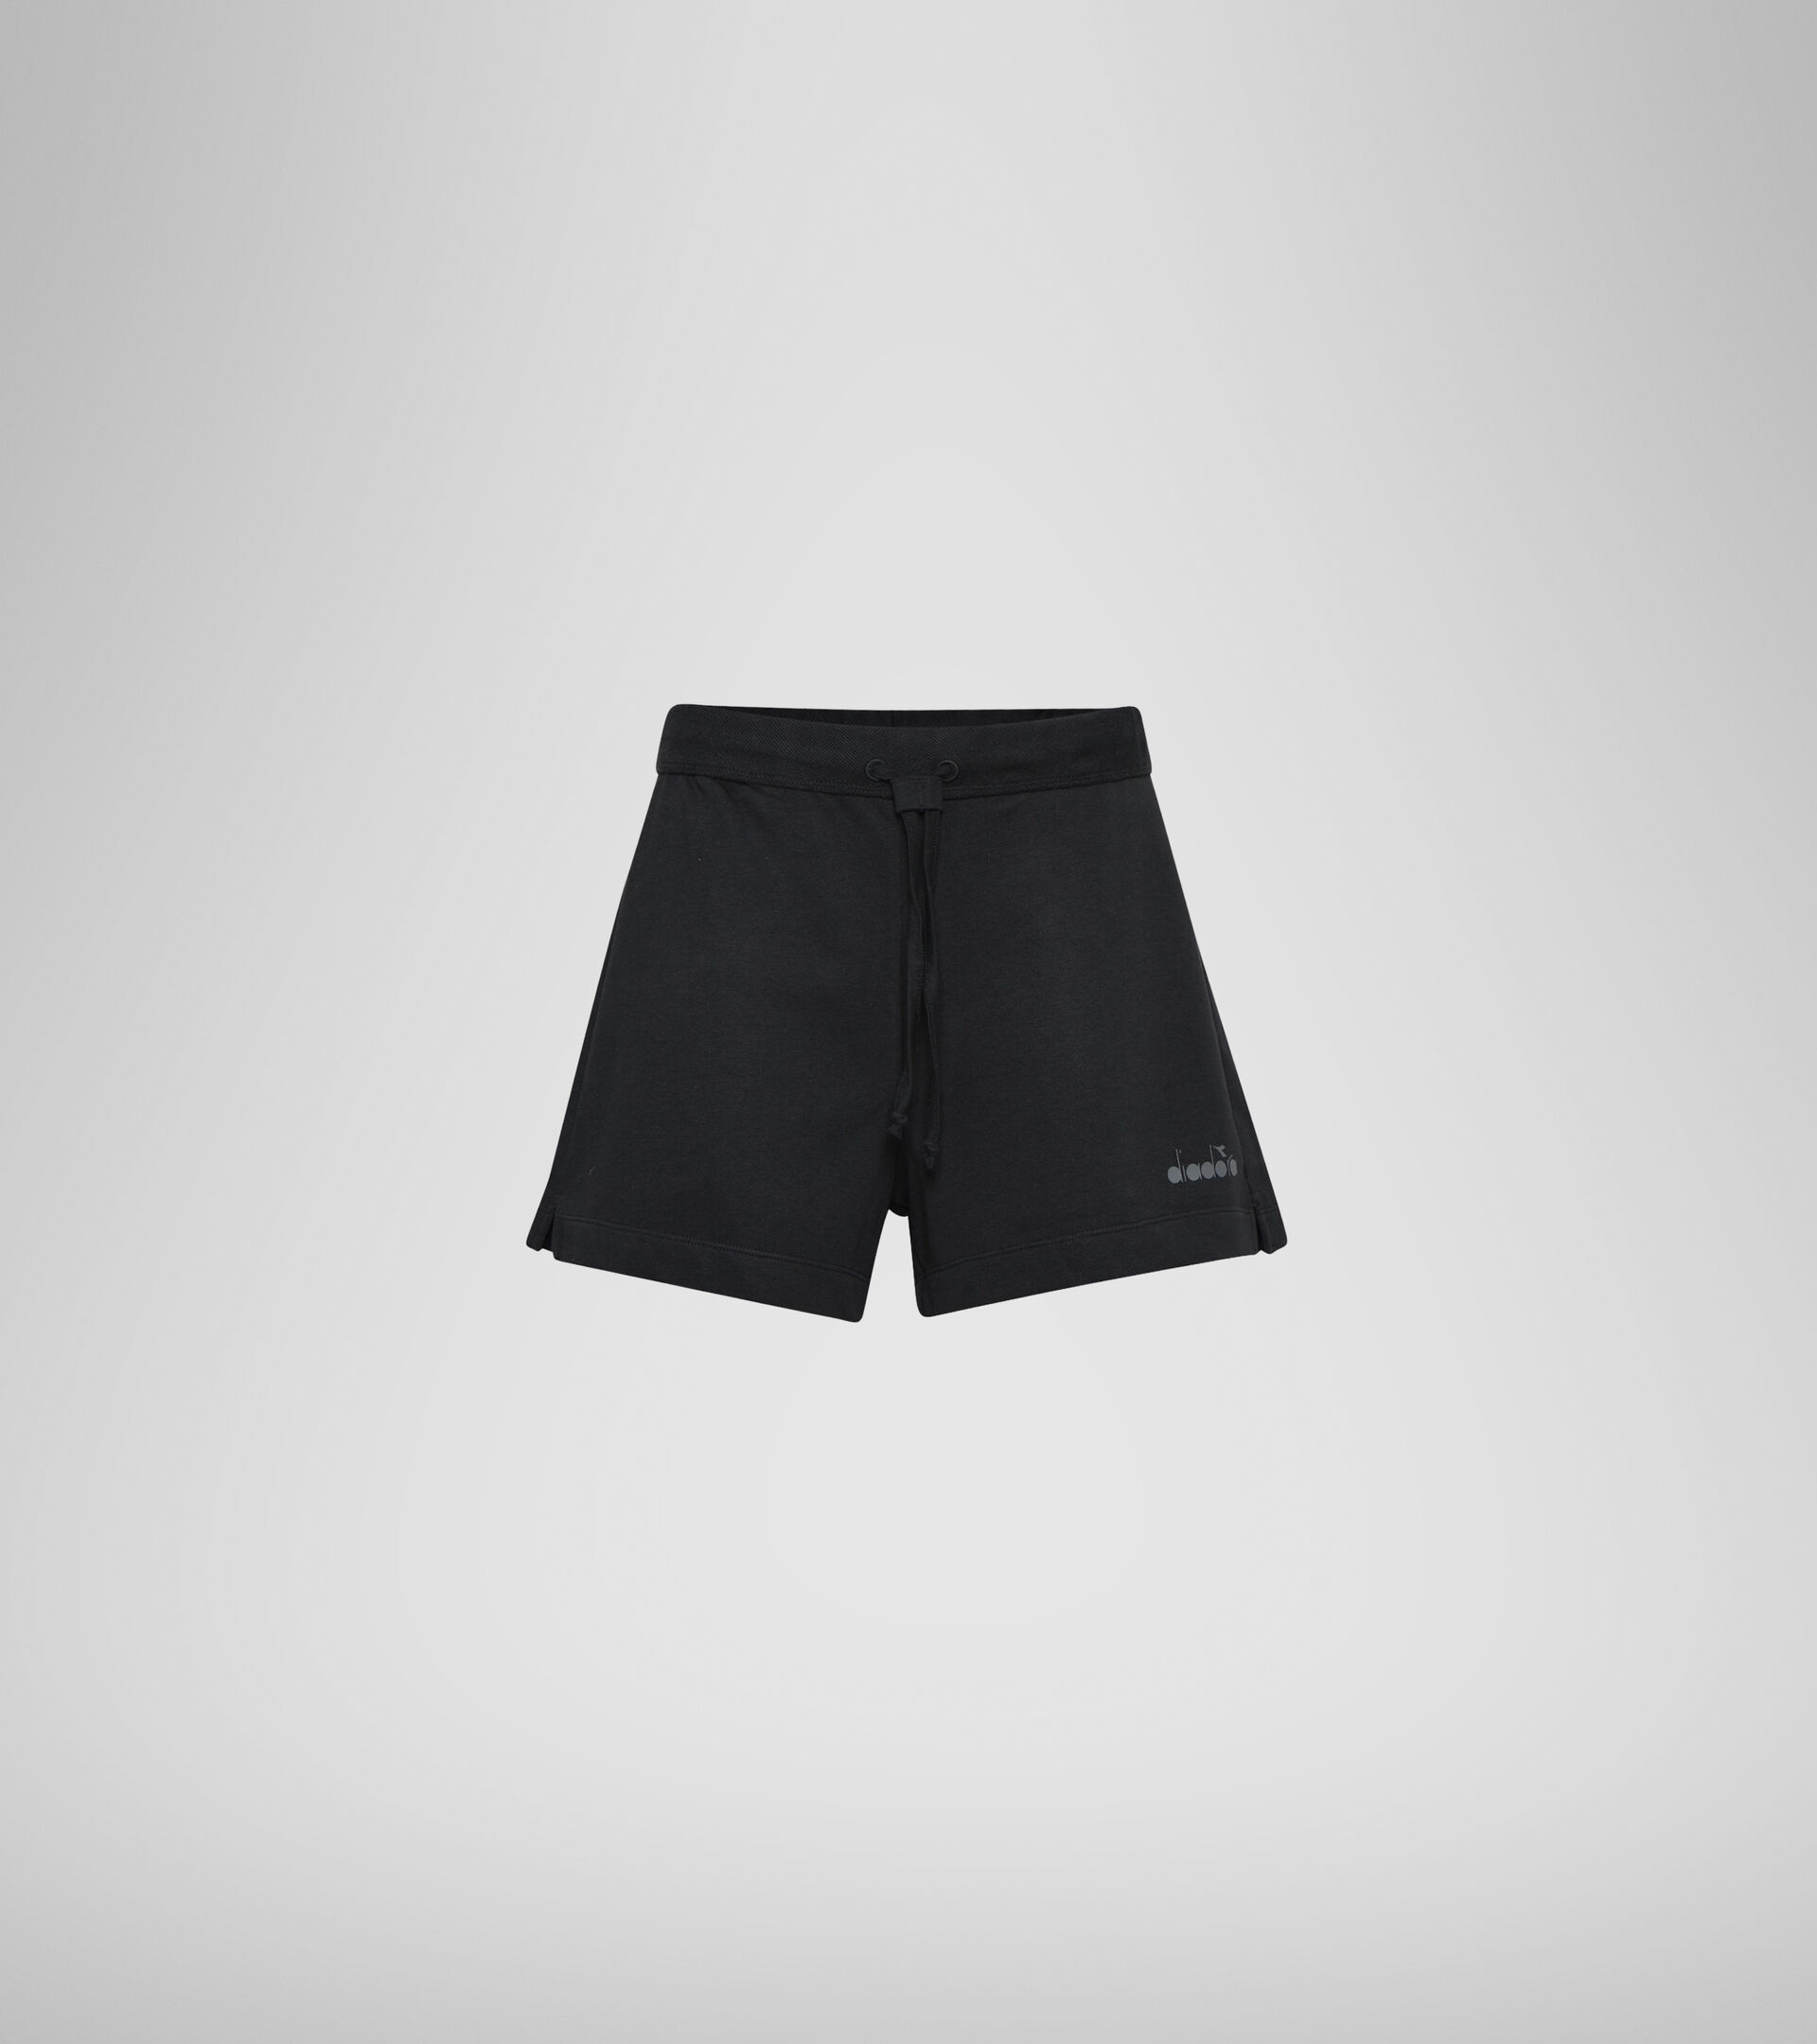 Shorts - Damen L.SHORT SCHWARZ - Diadora